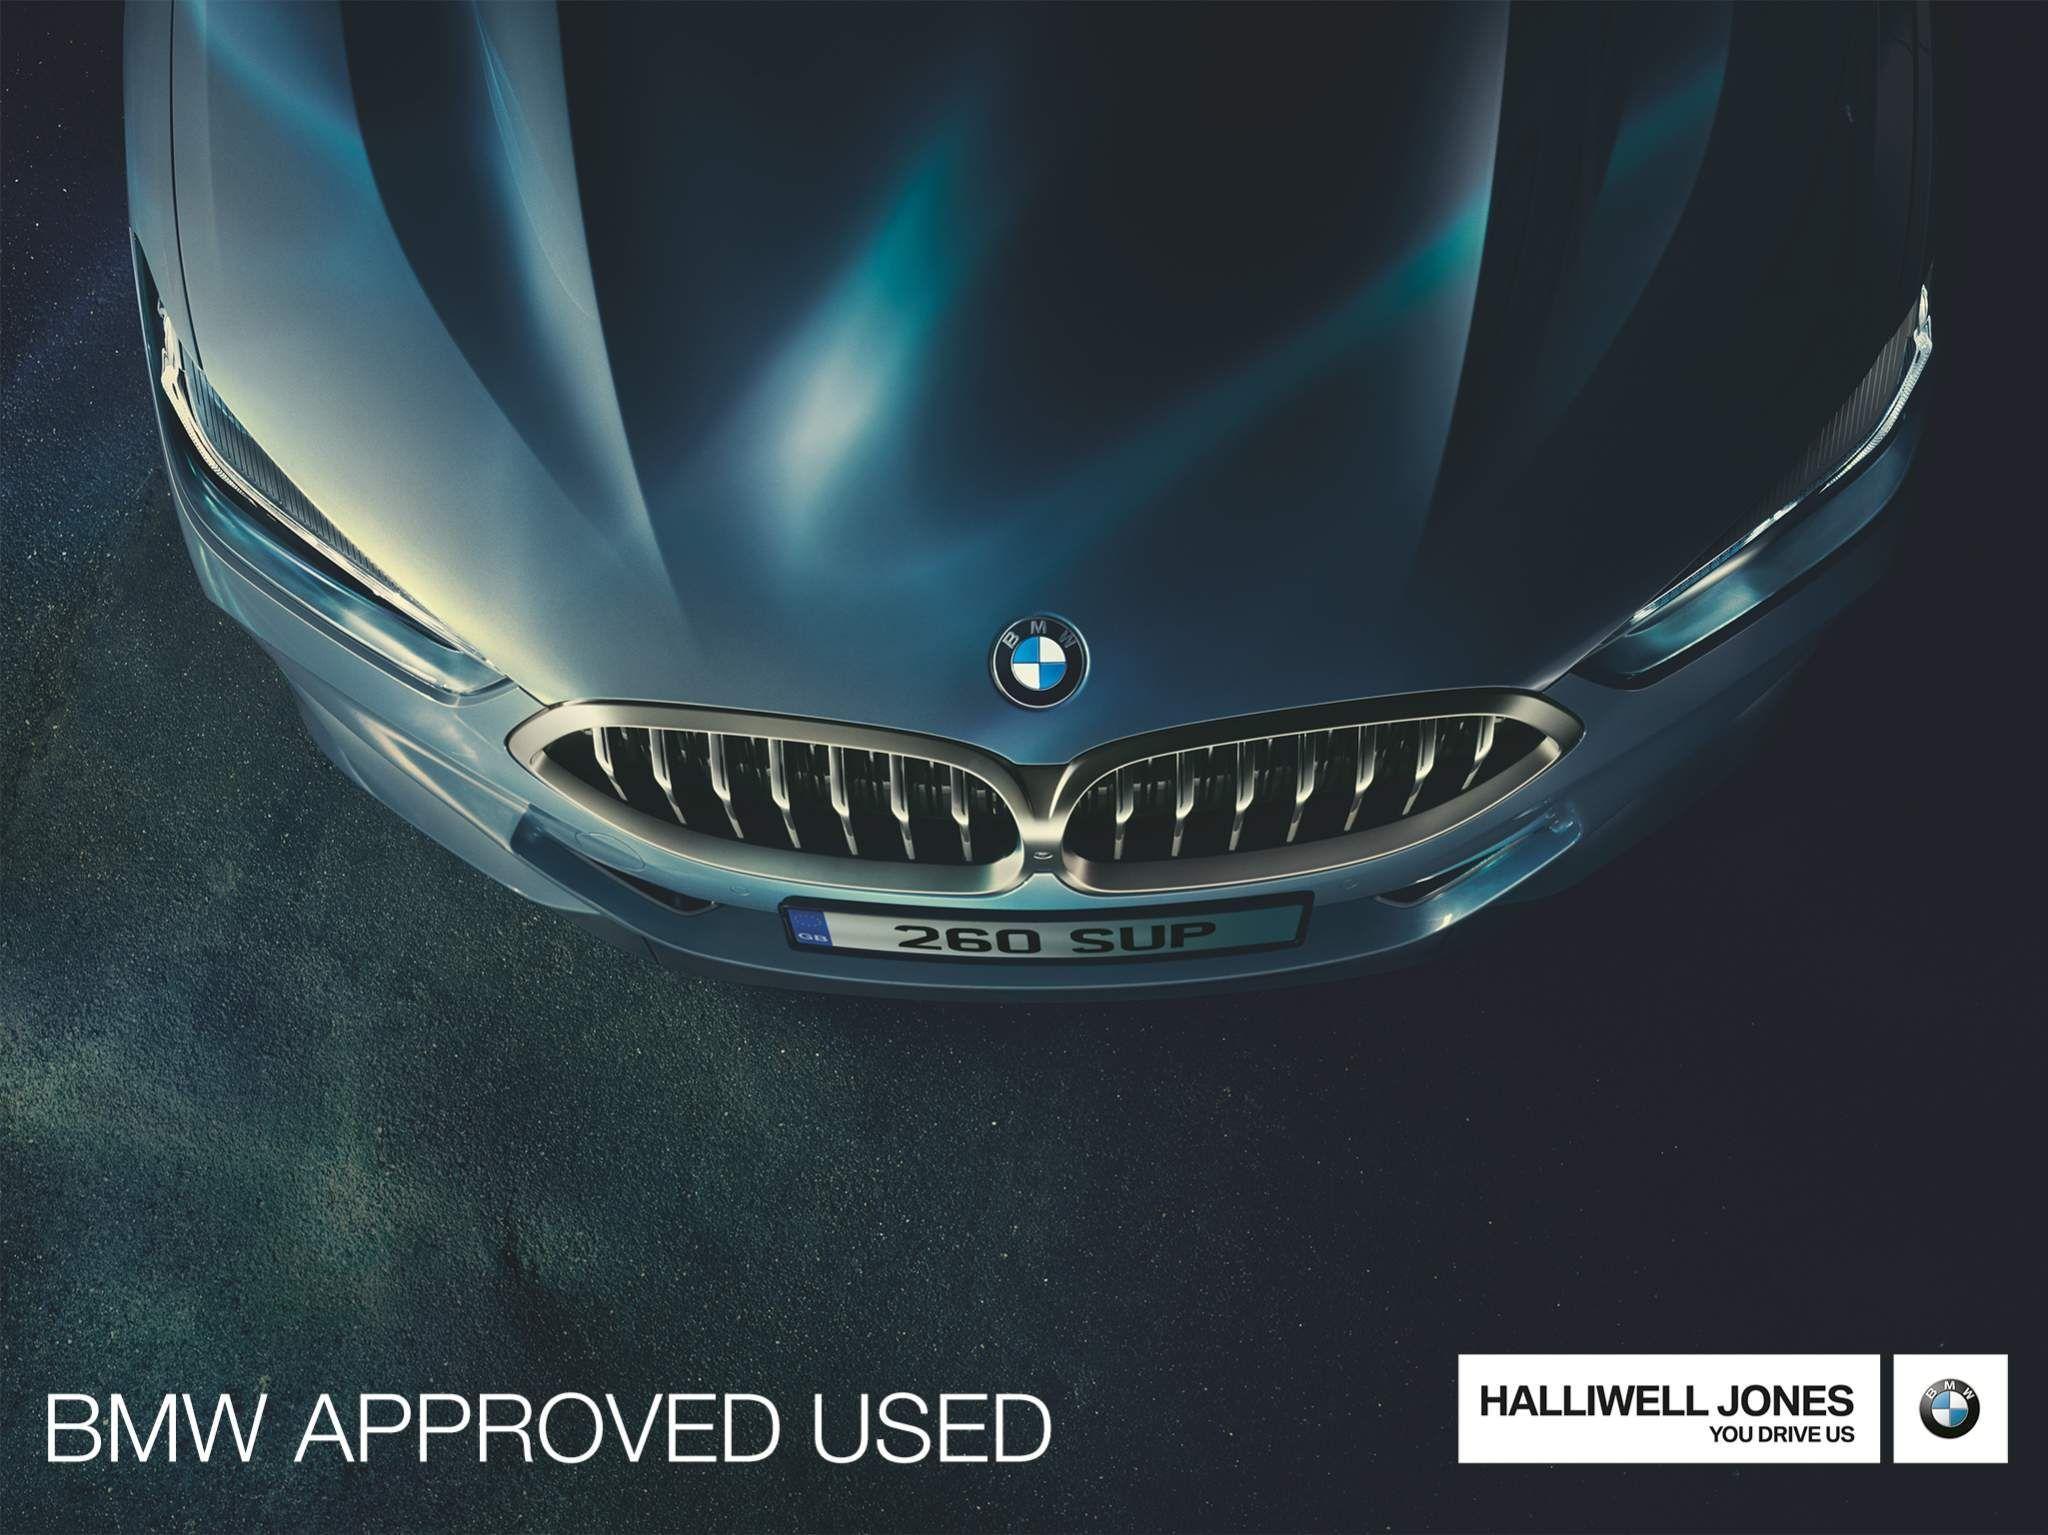 Image 1 - BMW 220d Sport Convertible (YE65GDK)